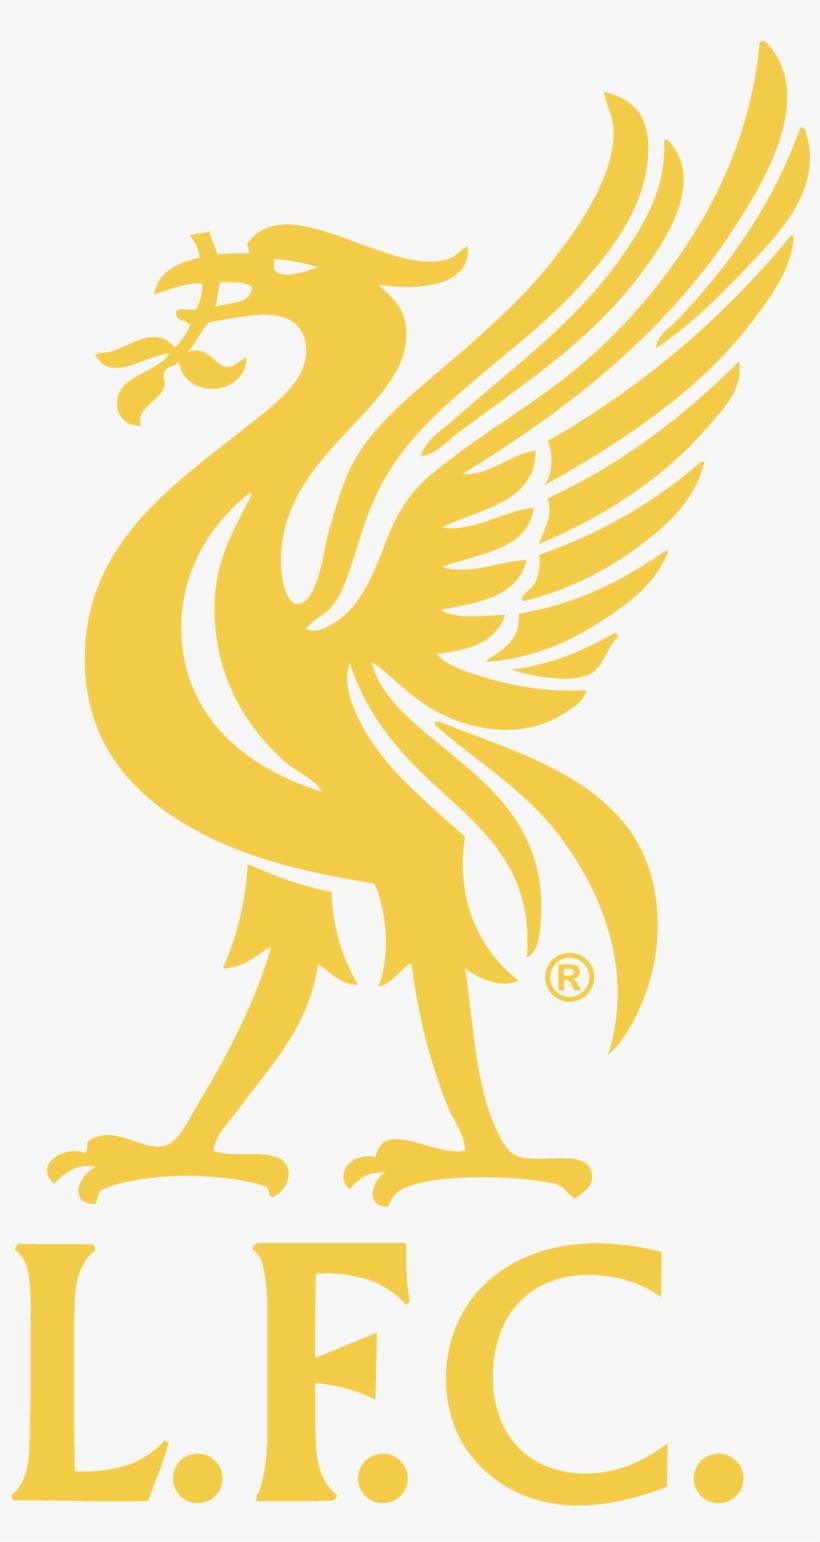 Liverpool Symbol - Liverpool Fc Crest - Free Transparent ...